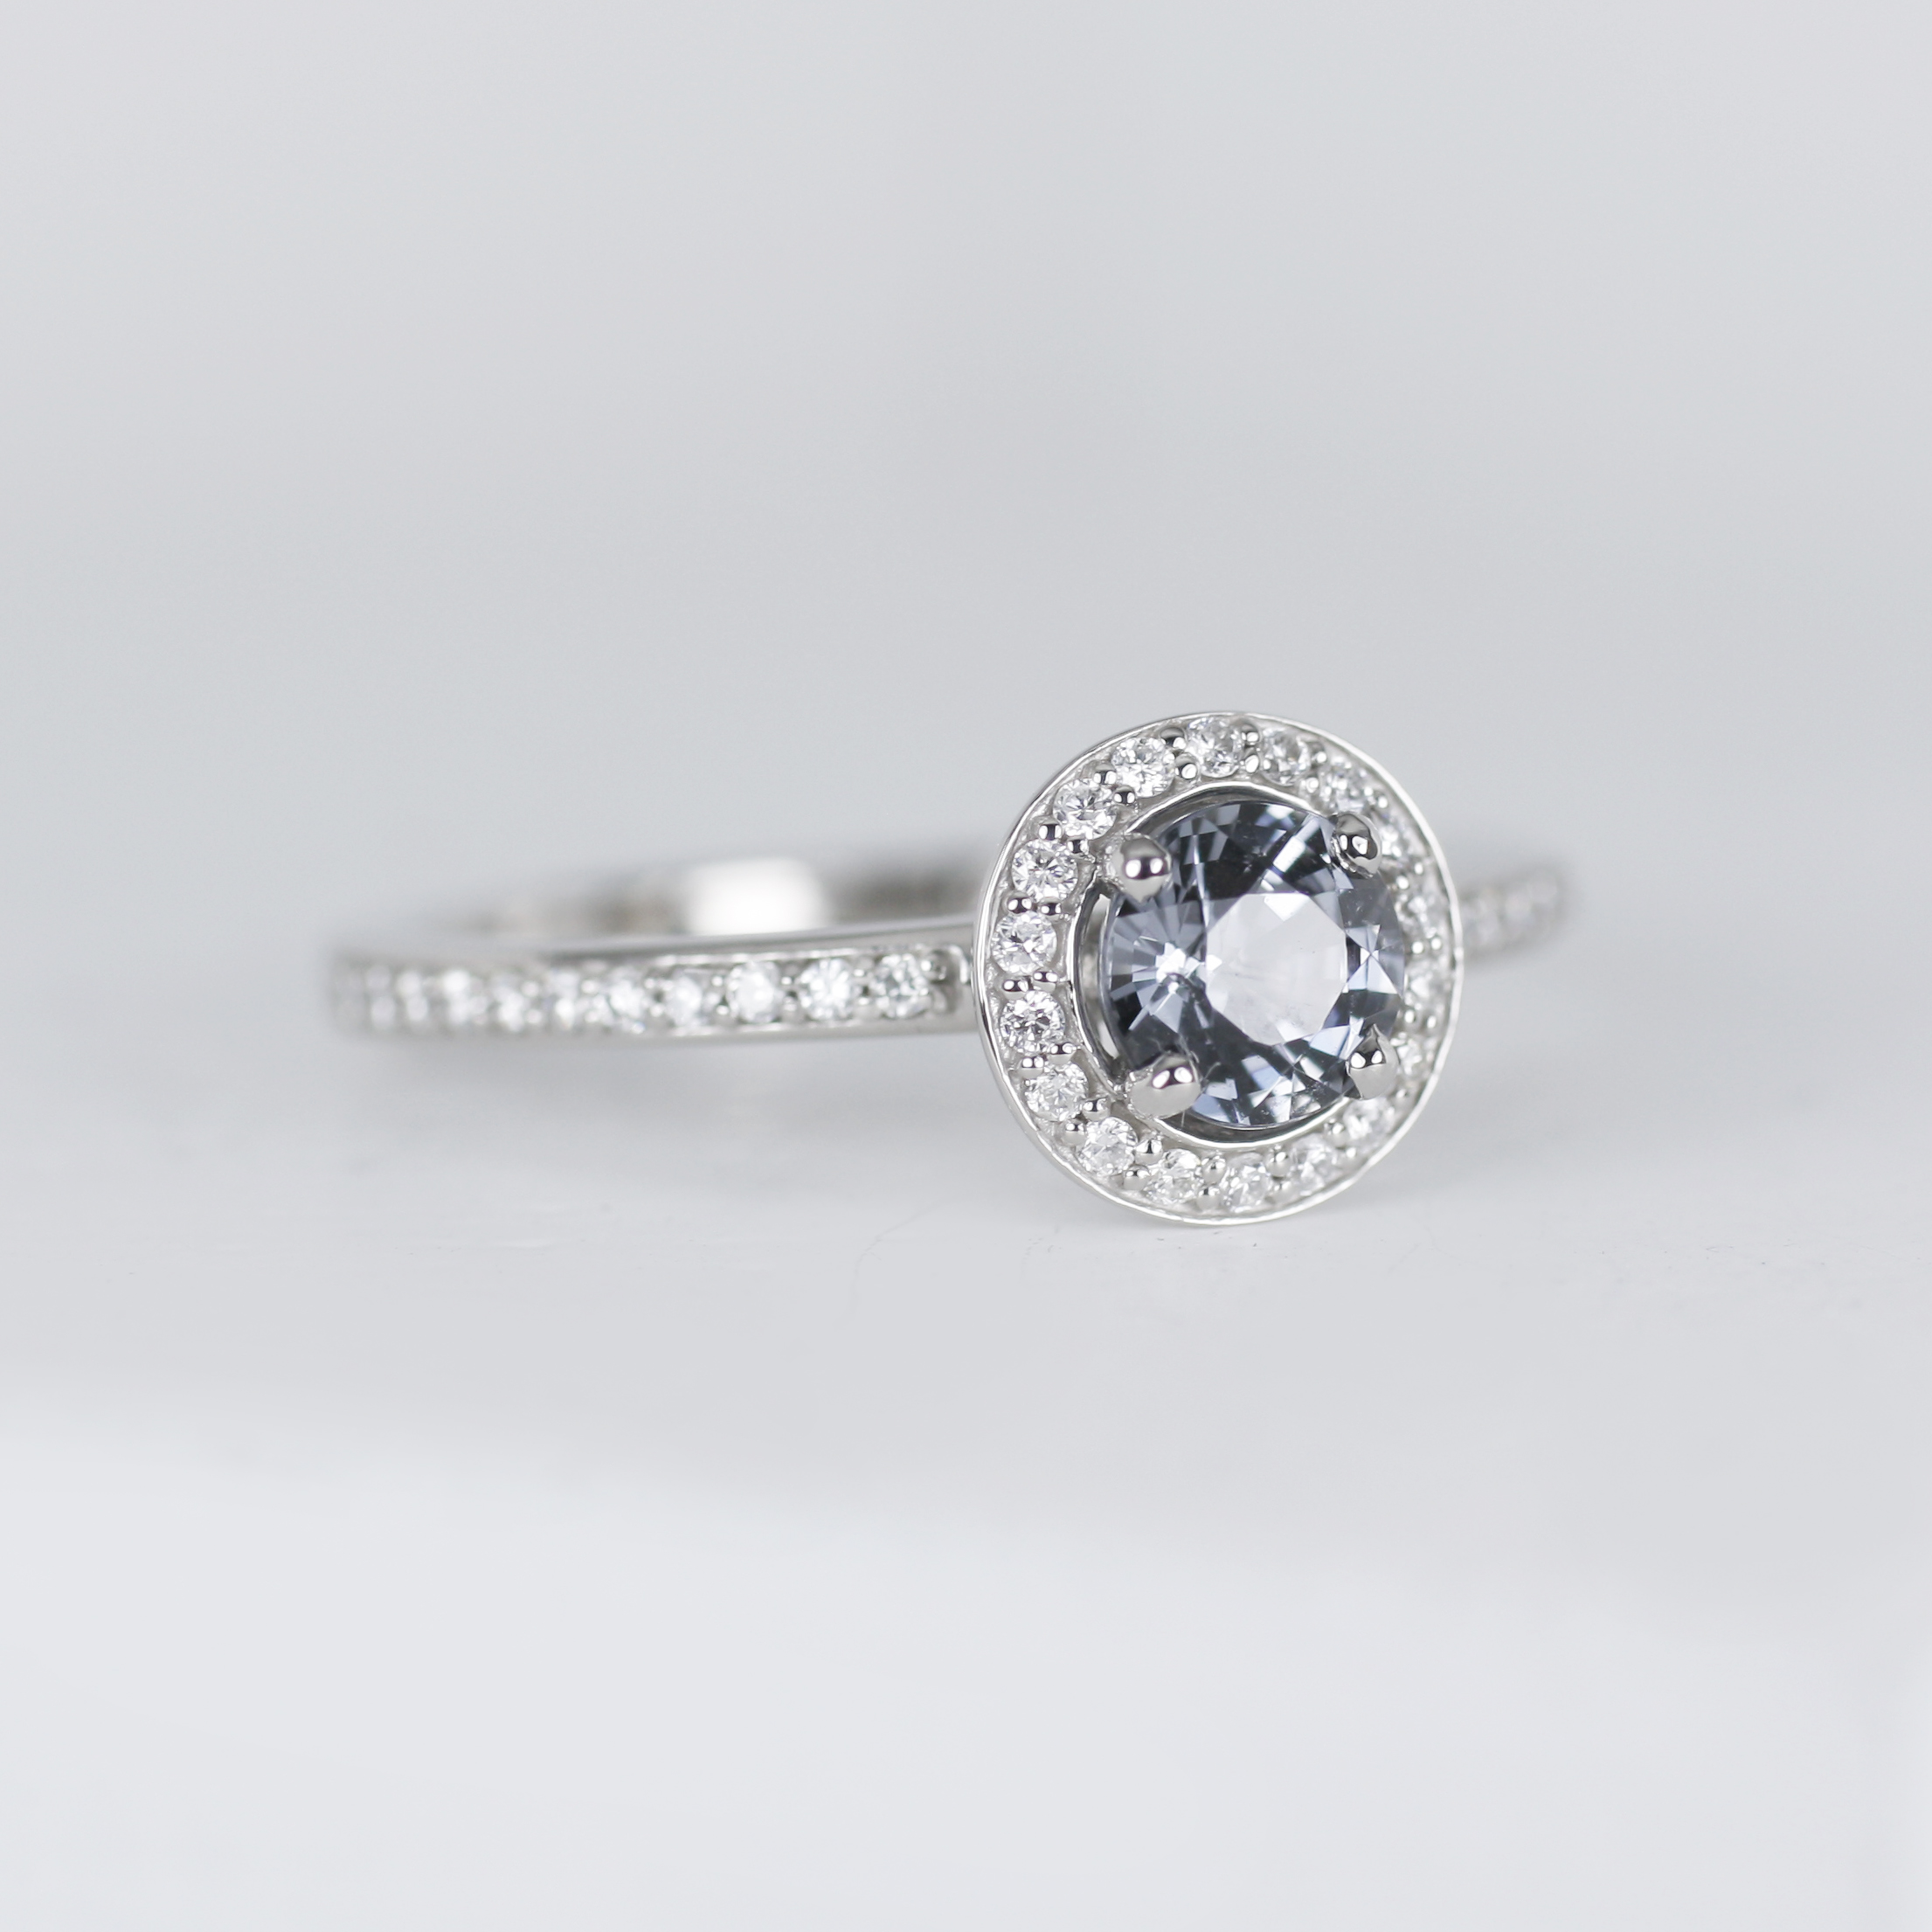 Palladium and Spinel, Diamond Ring/>               </div>               <div class=